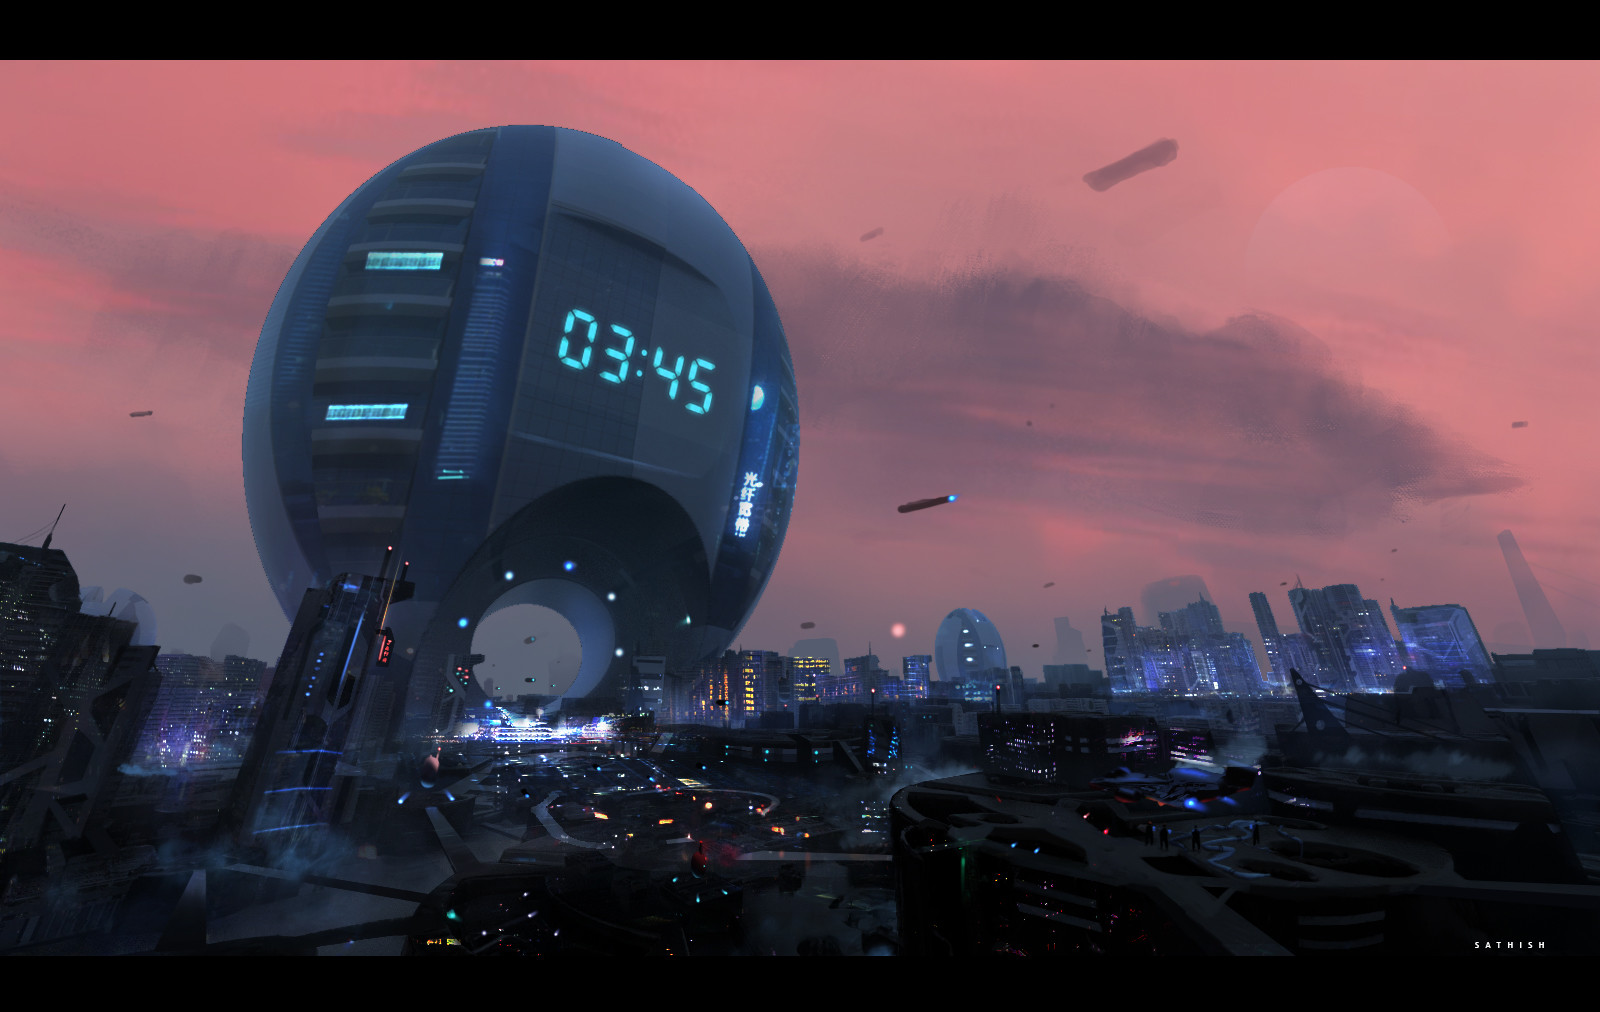 Sathish kumar futuristiccity newconcept 1 final 1